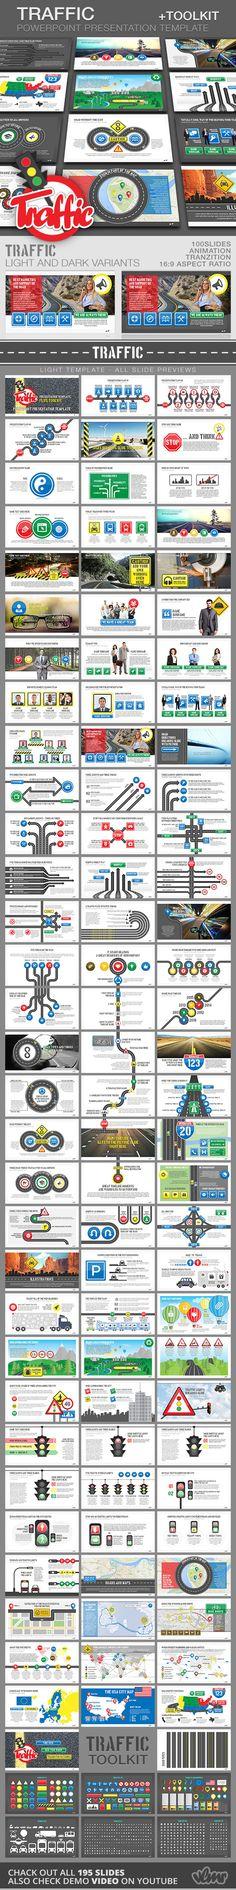 Traffic PowerPoint Presentation Template + Toolkit - Creative PowerPoint Templates